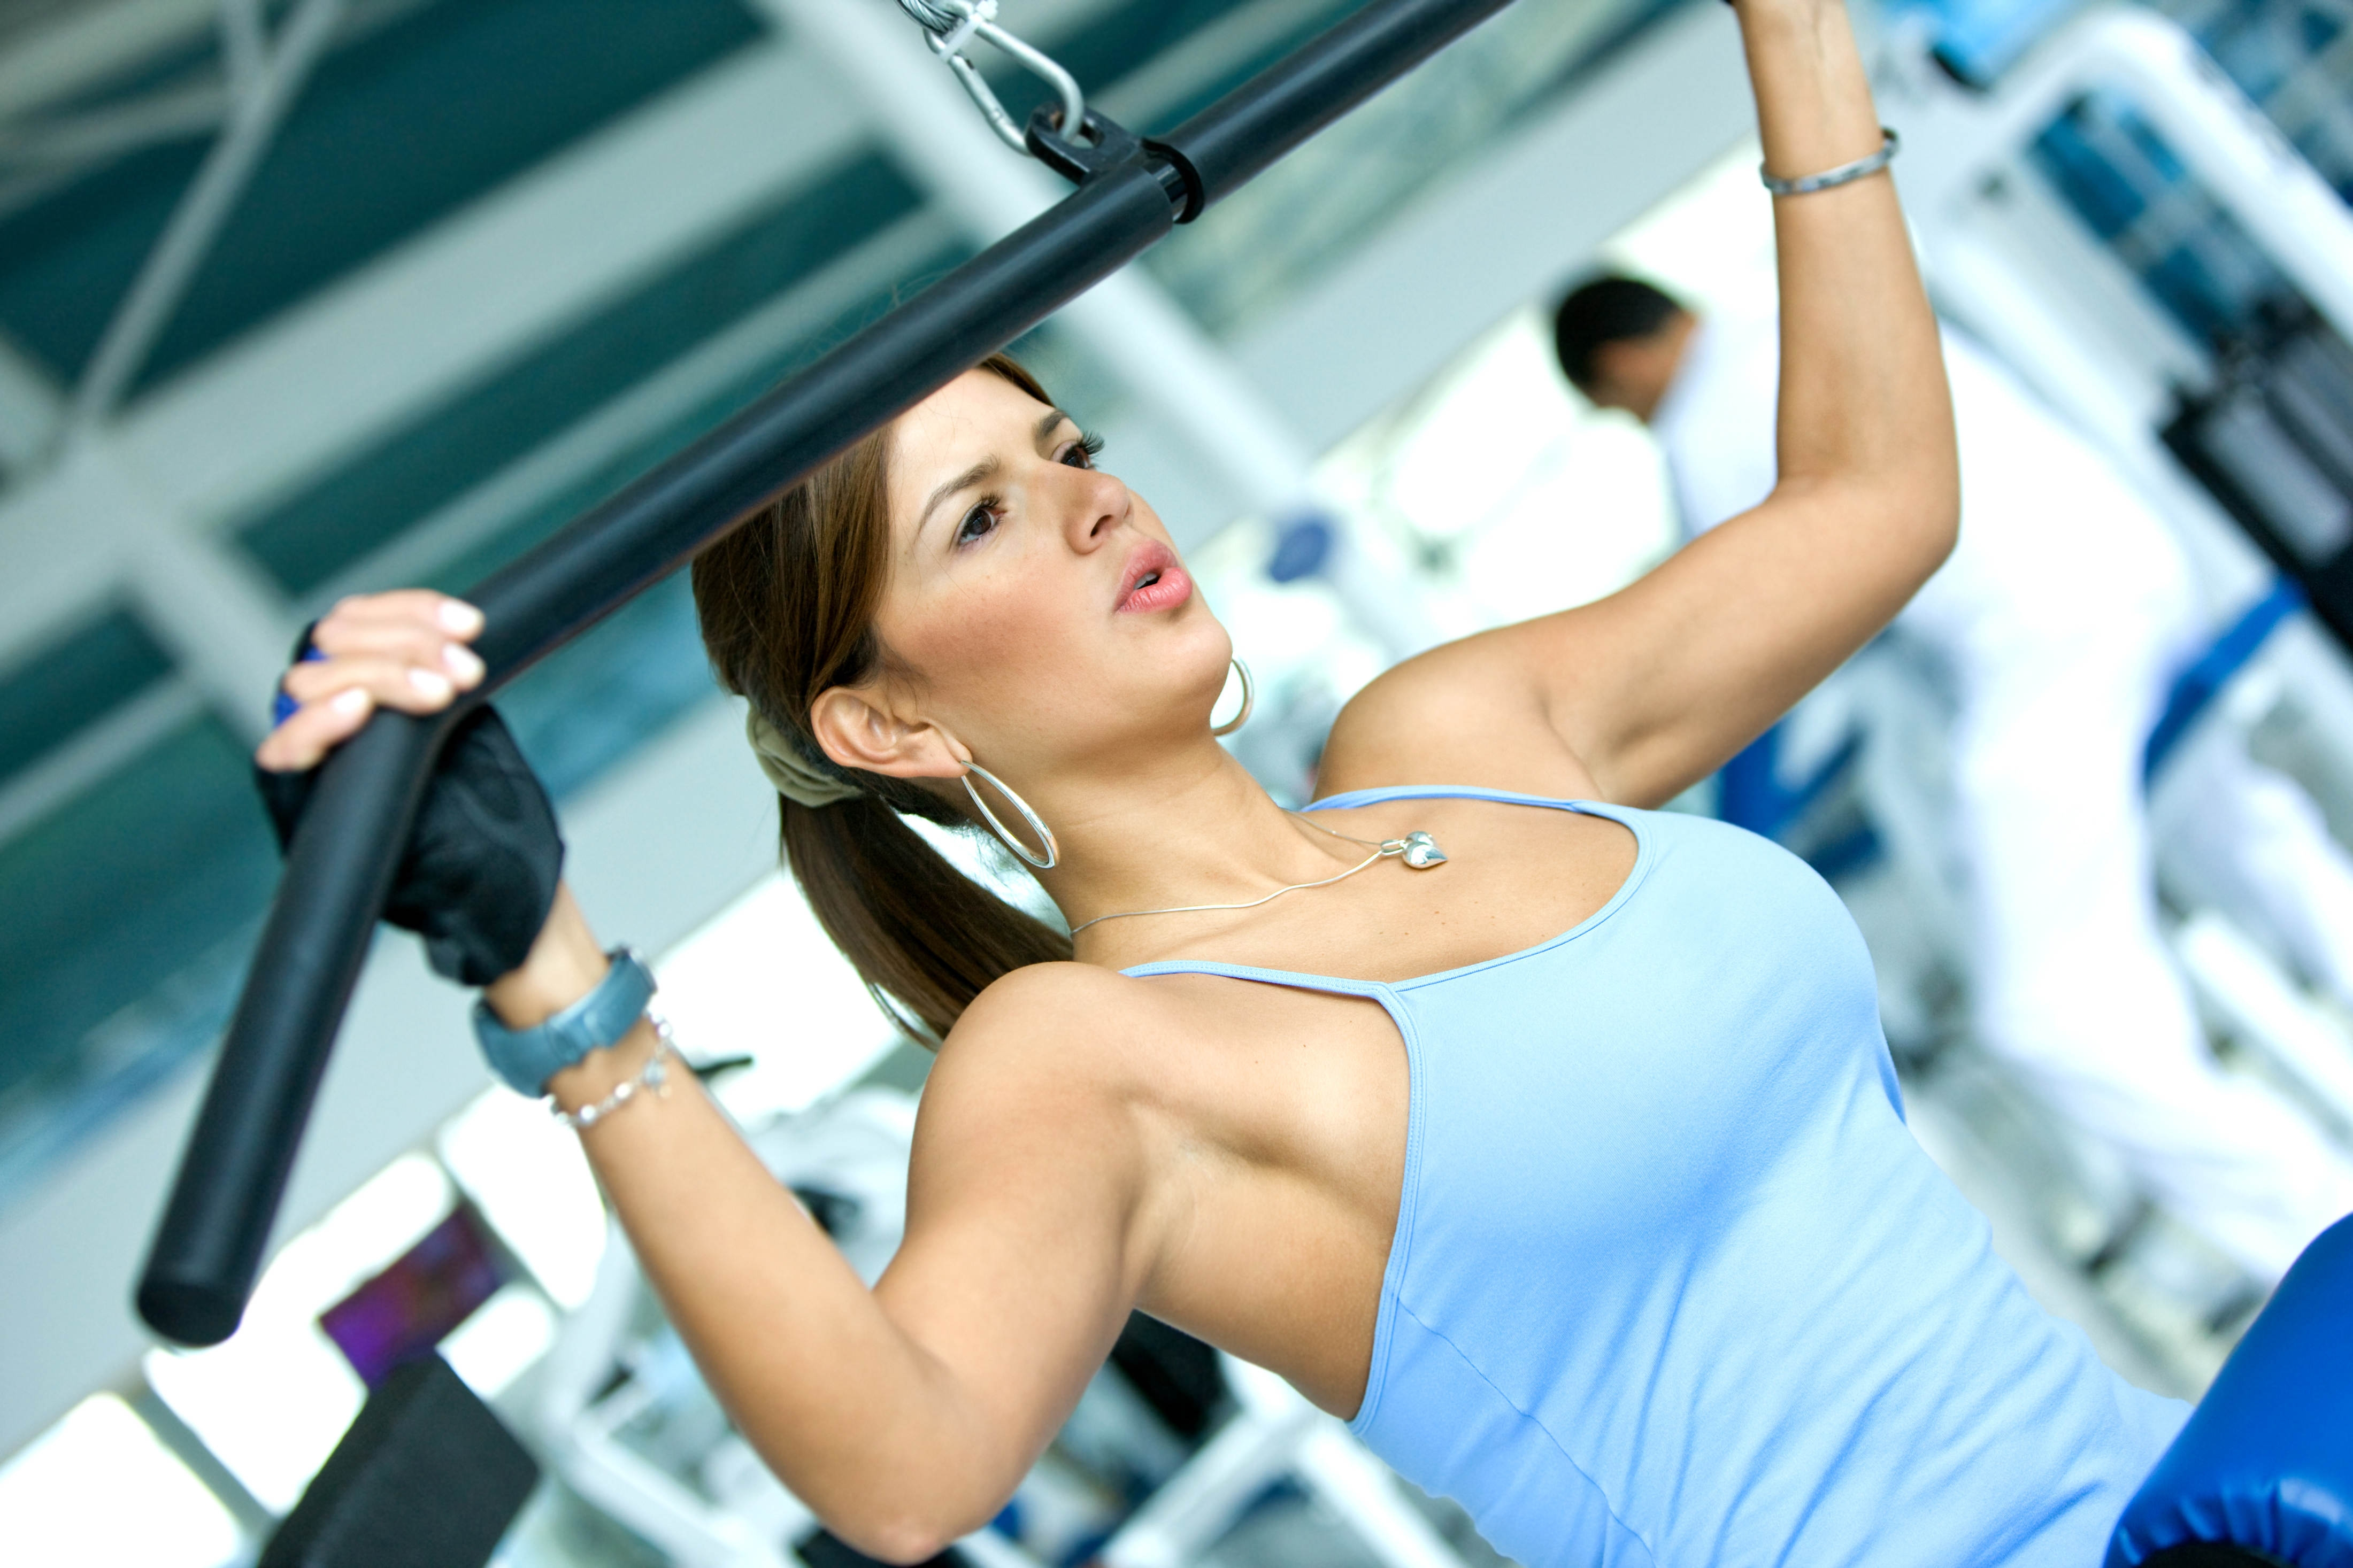 Girls Fitness Desktop Wallpaper Download Desktop Wallpaper 4400x2933